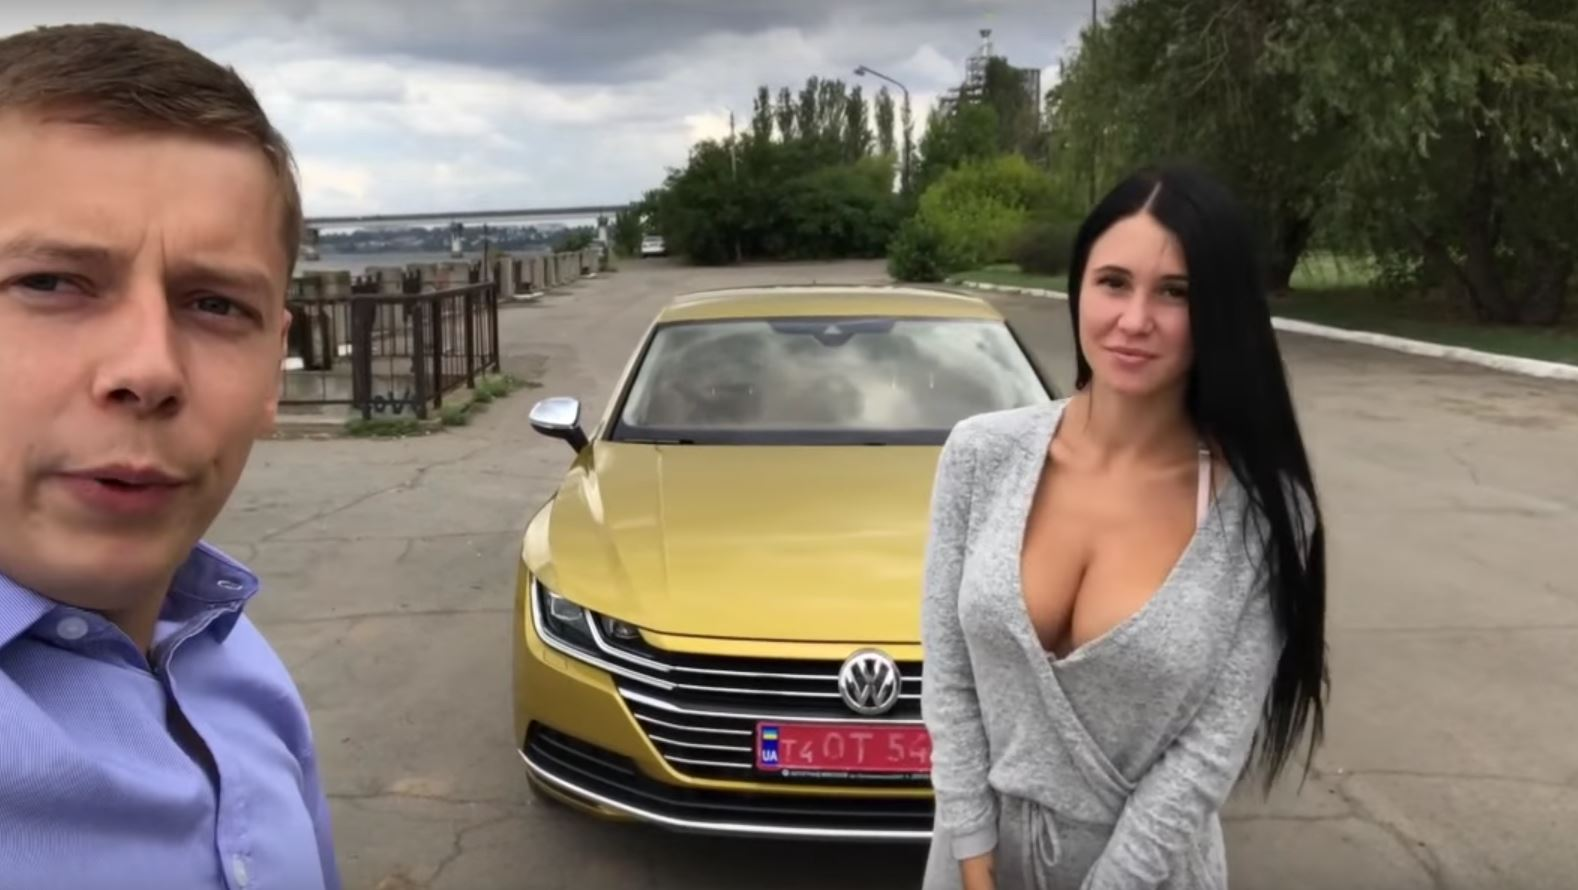 Vw Arteon Trunk Is Big Enough For A Ukrainian Brunette To Rest In